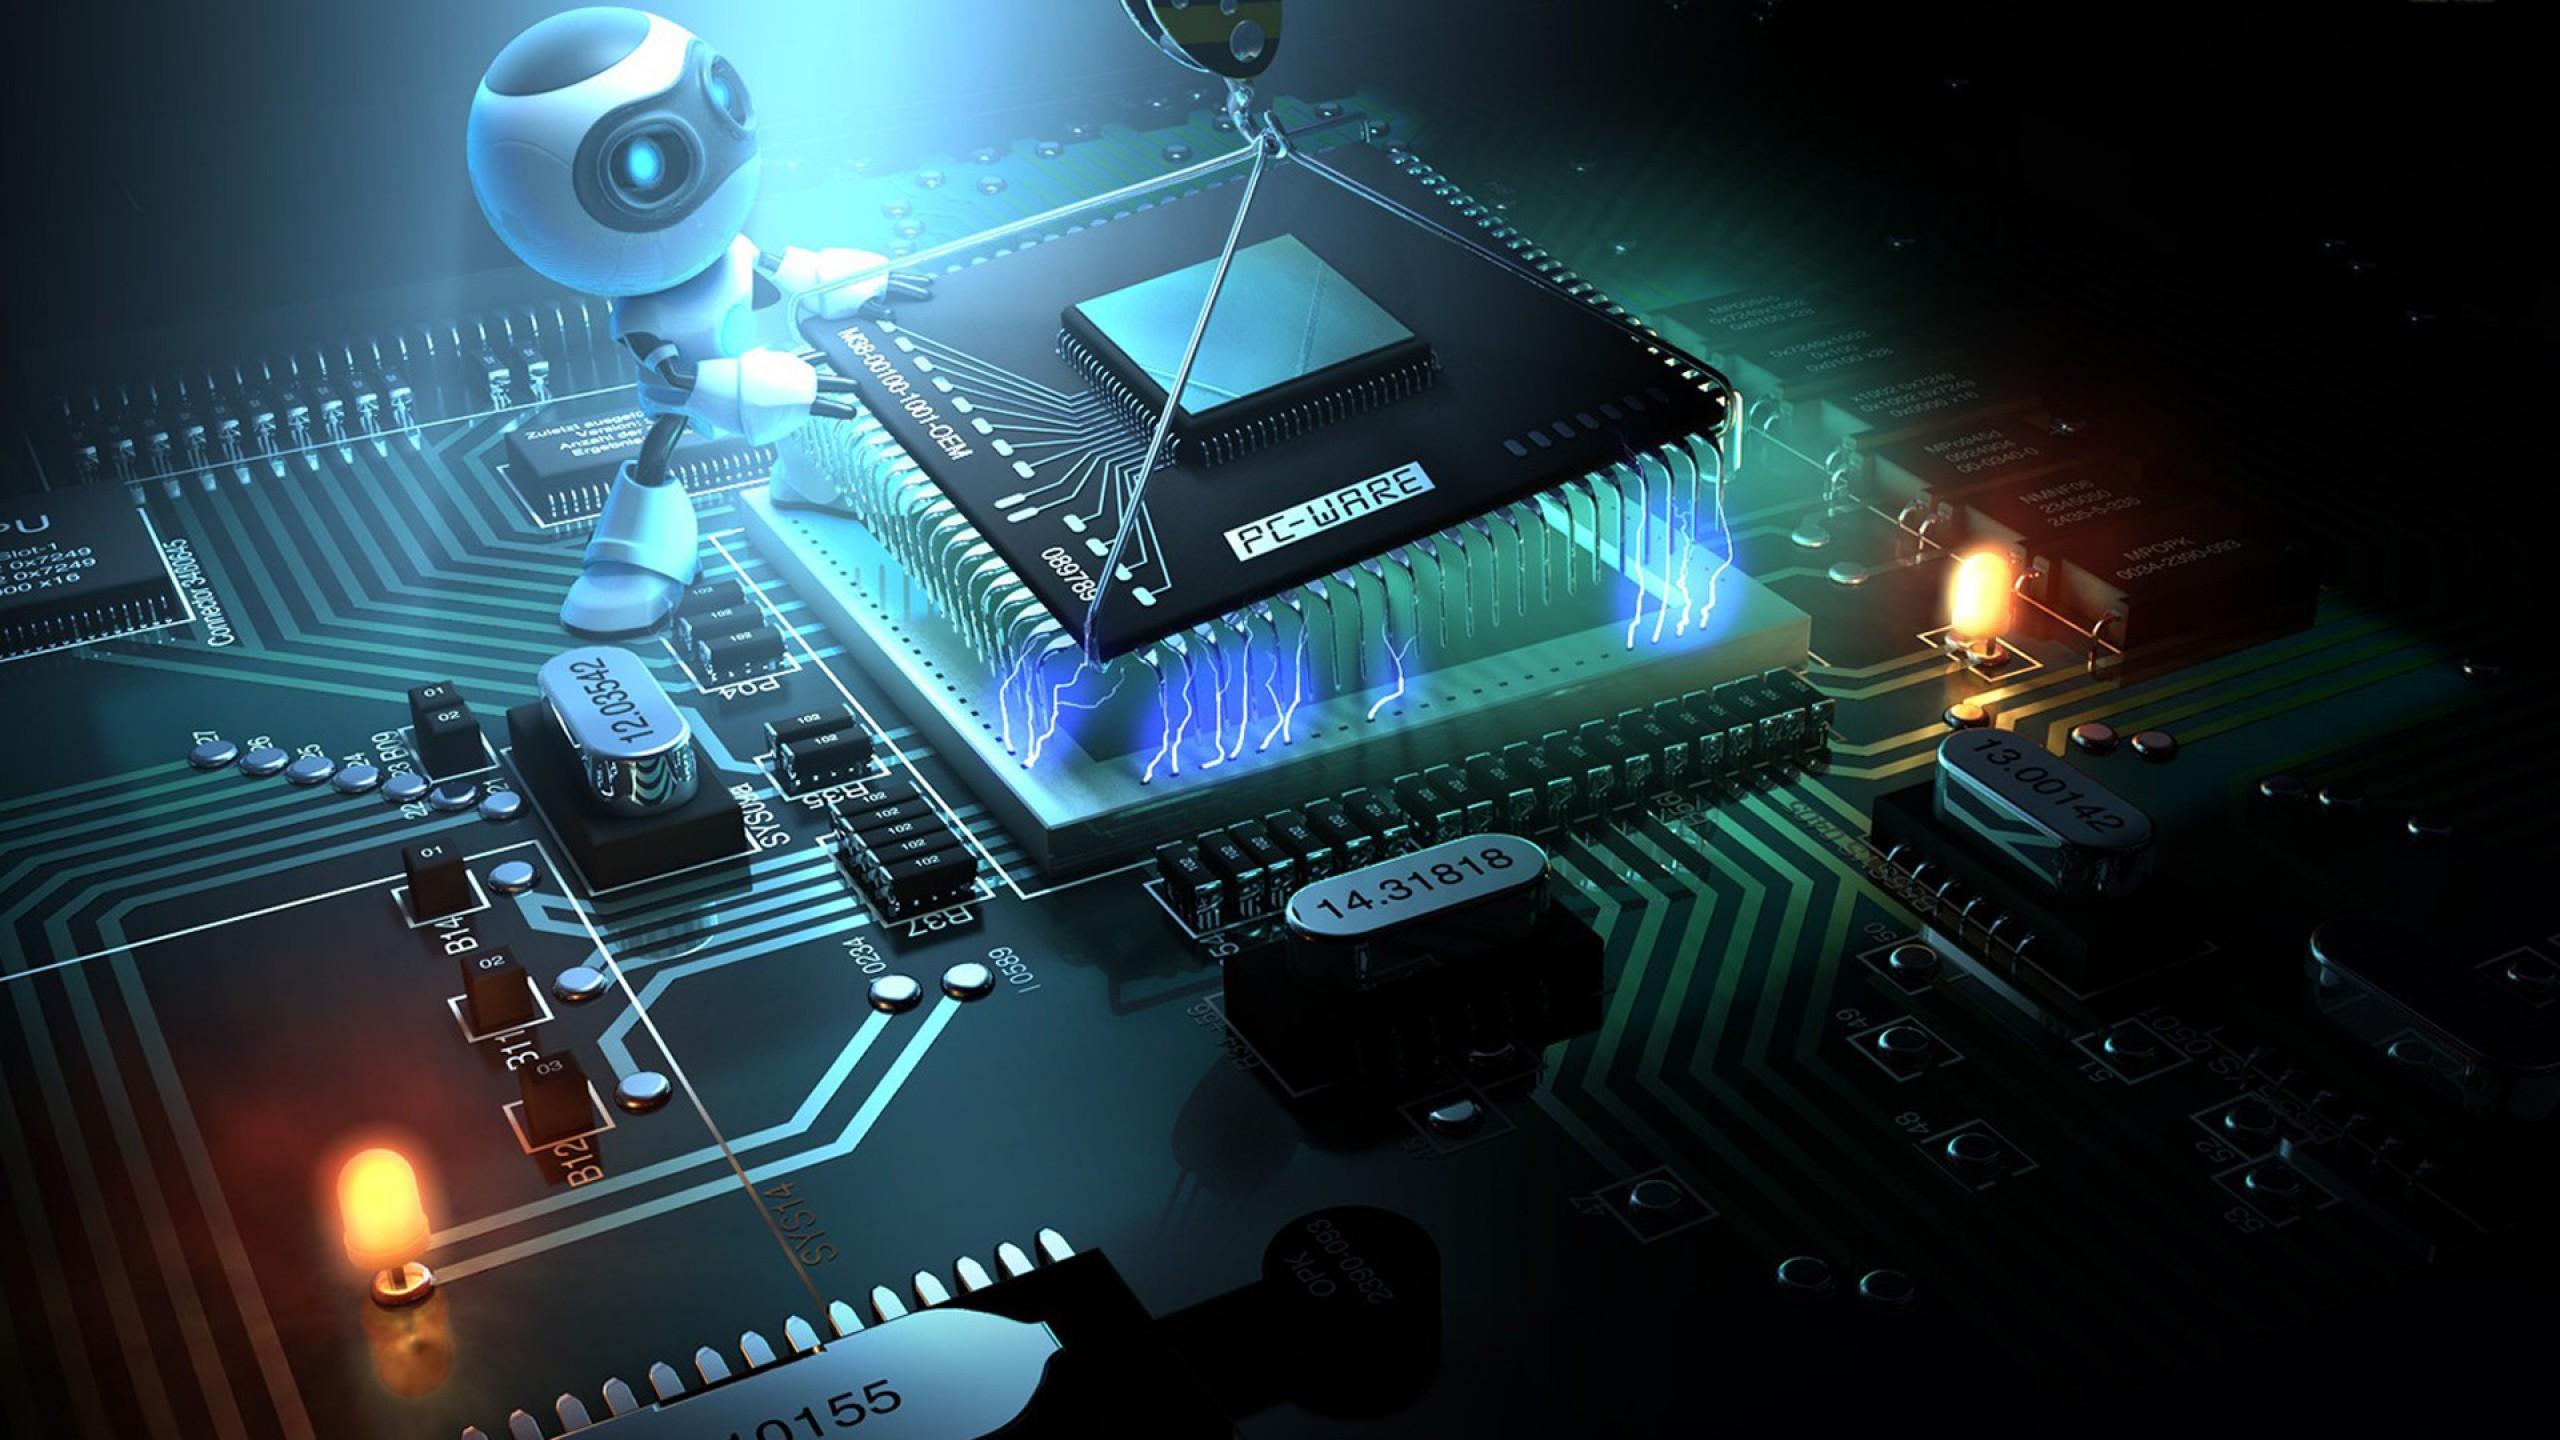 PDF مقاله در مورد میکرو کنترلر های ARM